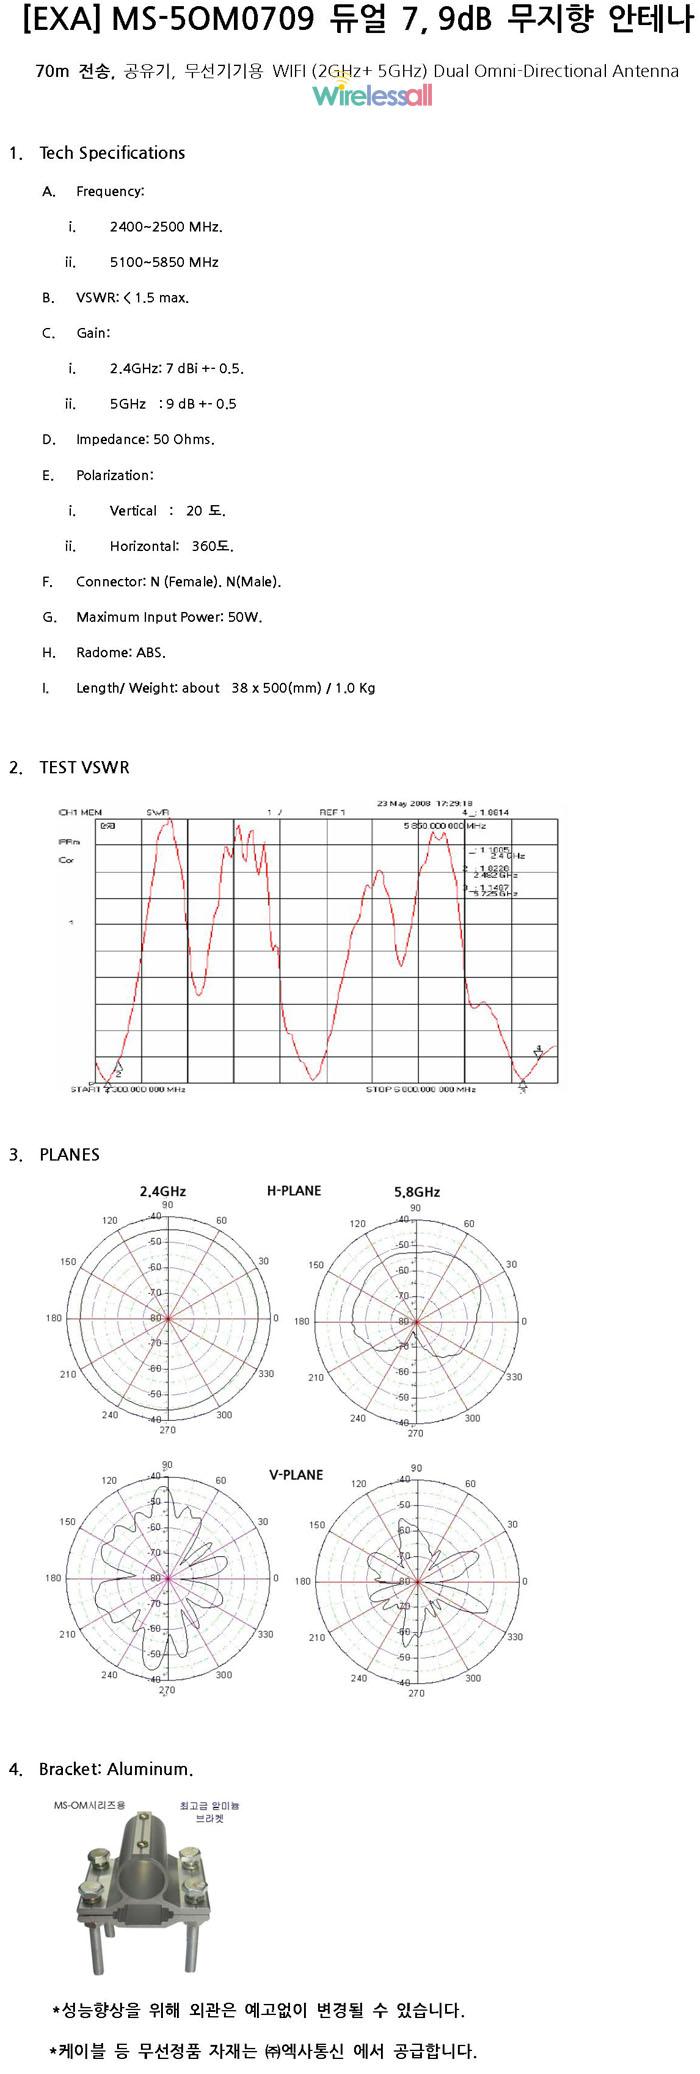 MS-5OM0709-SPEC